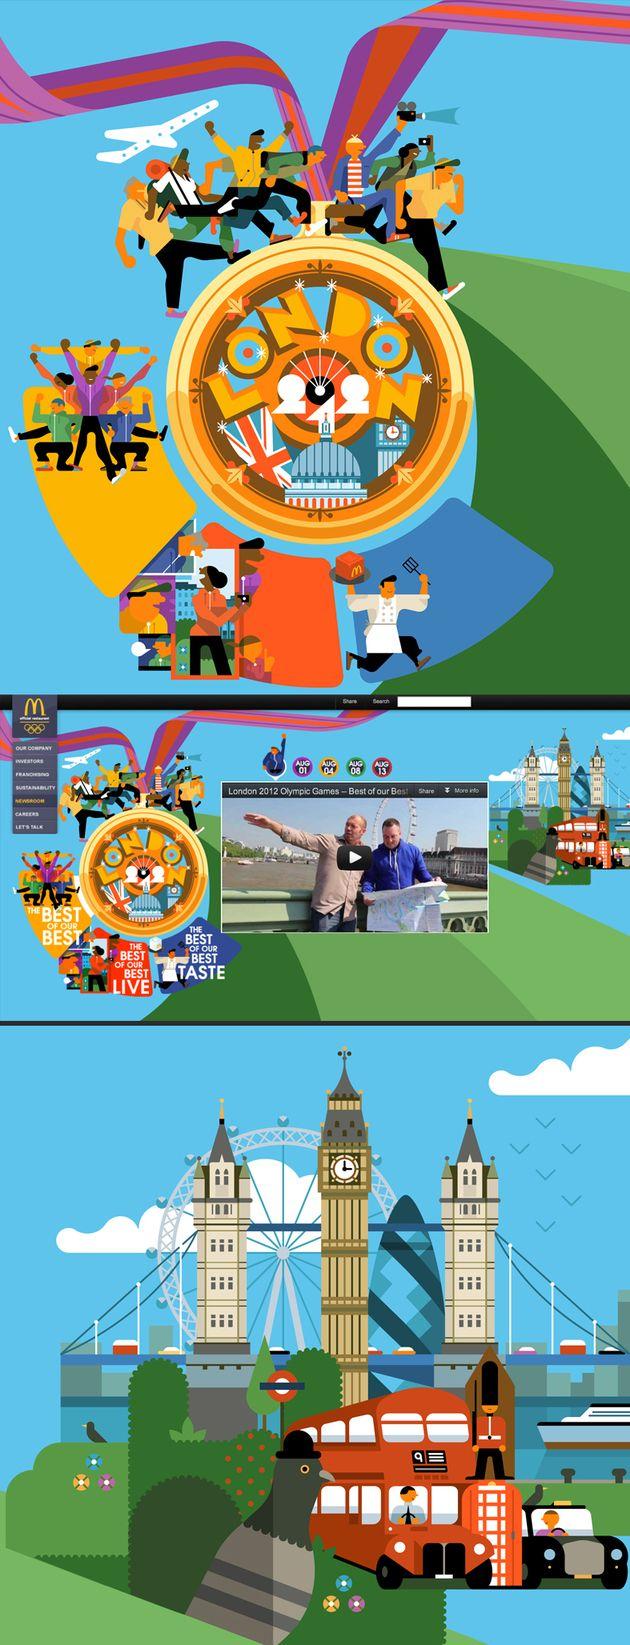 Kolchoz / McDonalds London Olympics 2012